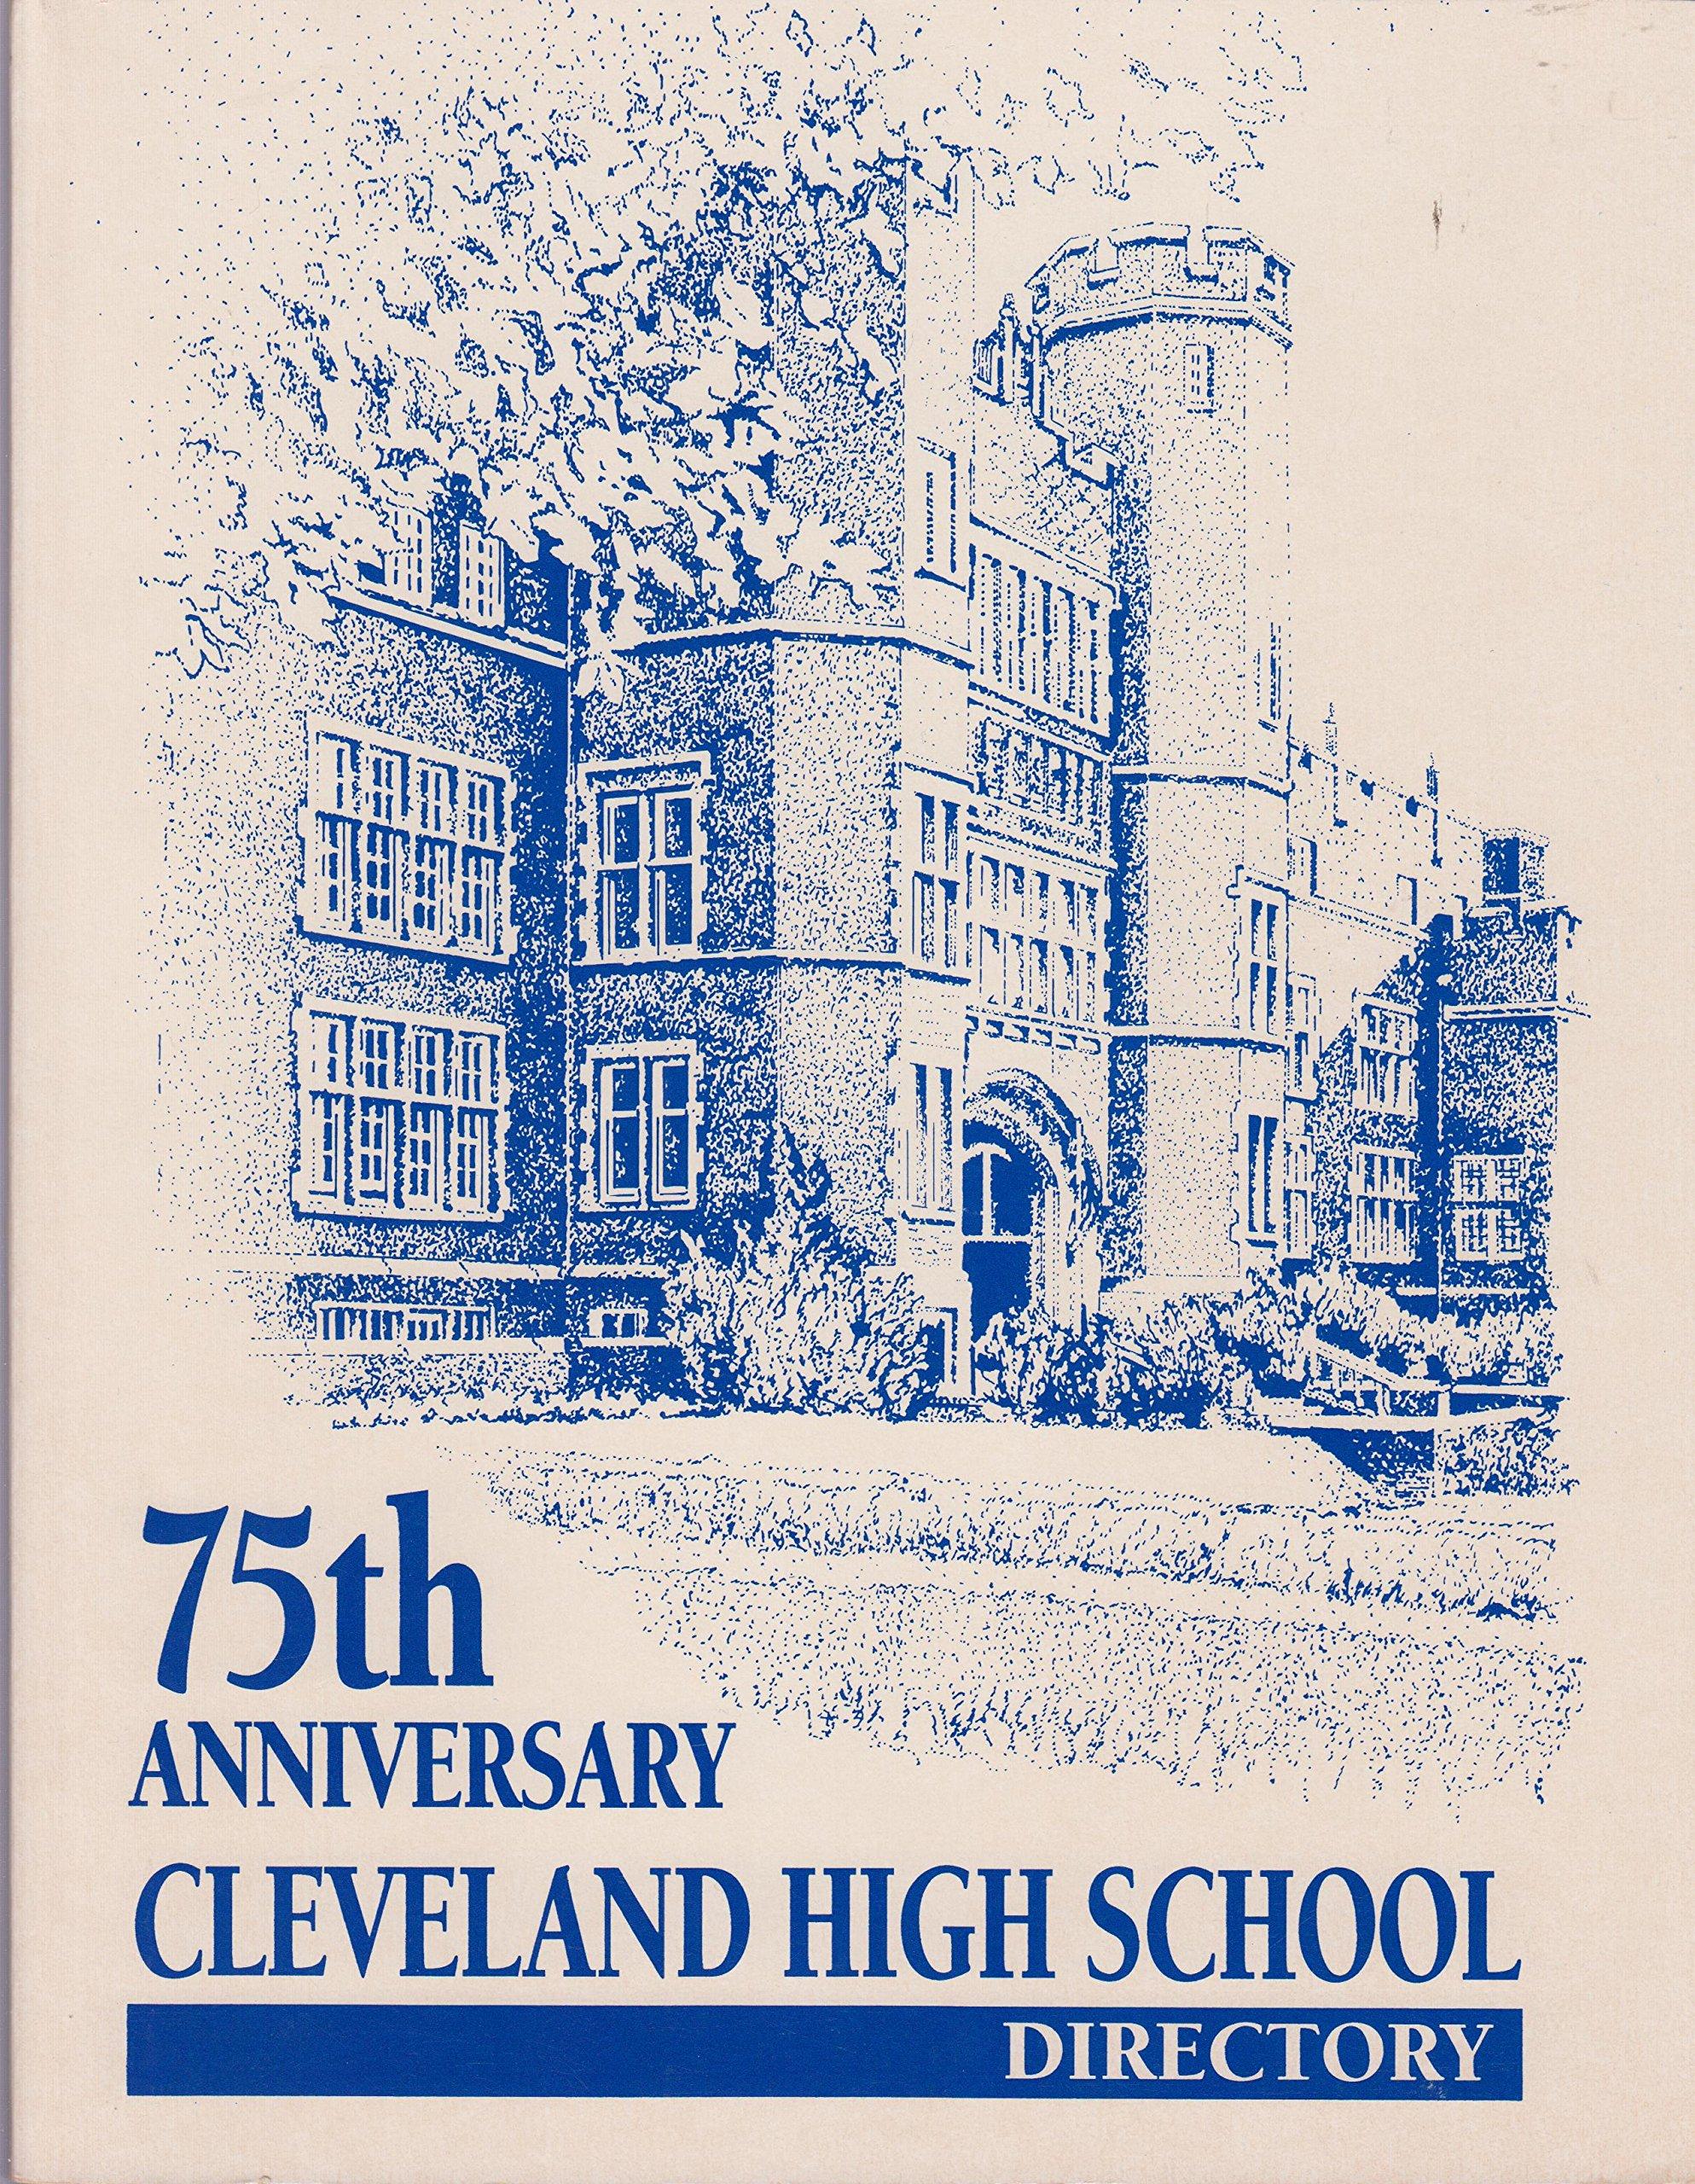 Grover Cleveland High School 75th Anniversary Alumni